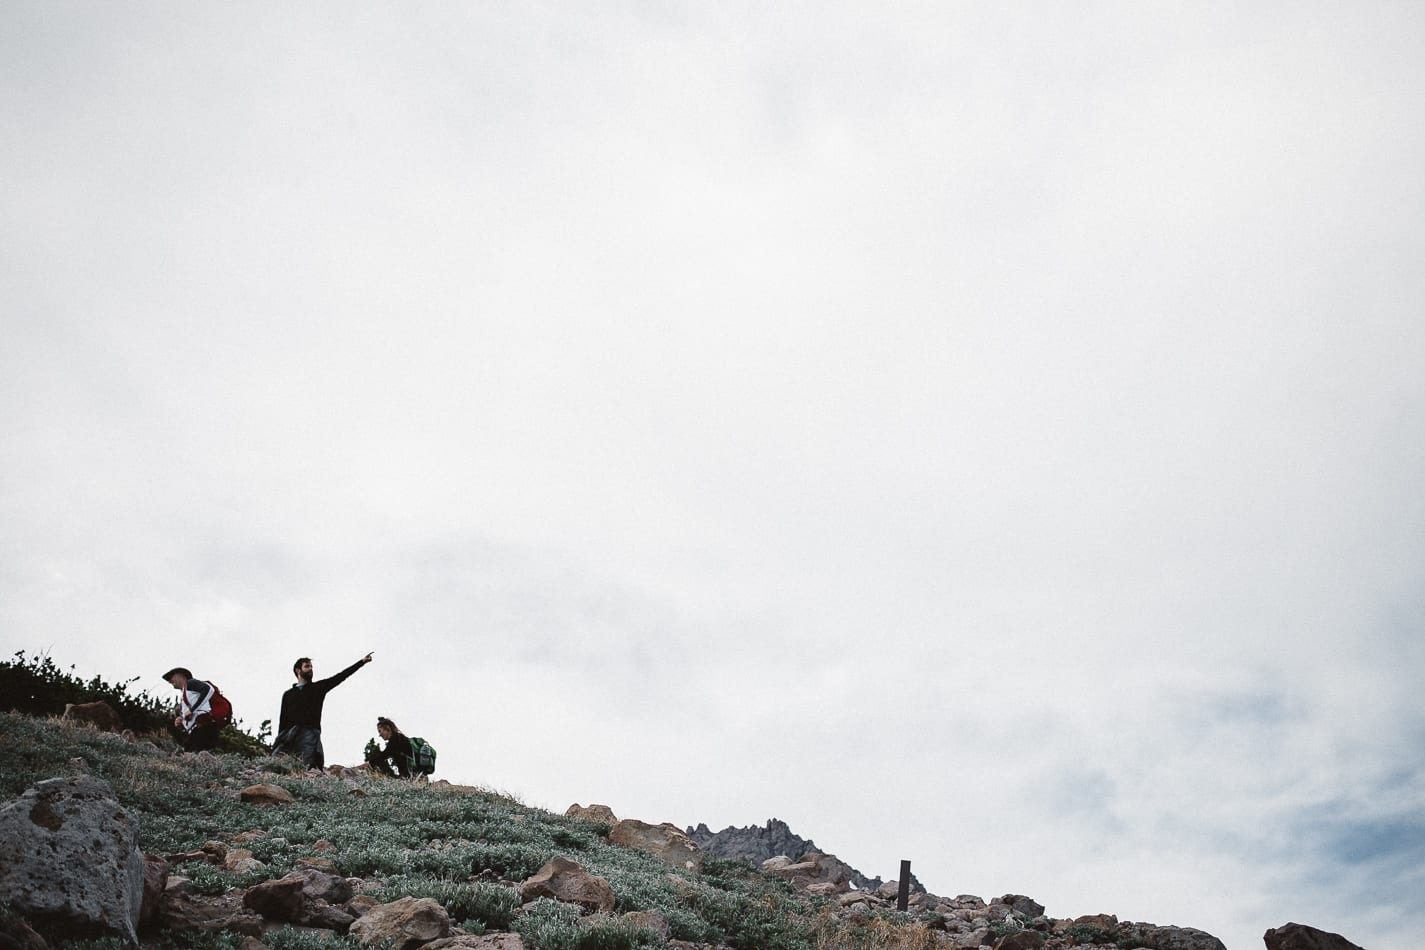 mount-lassen-california-adventure-lifestyle-photorapher-17